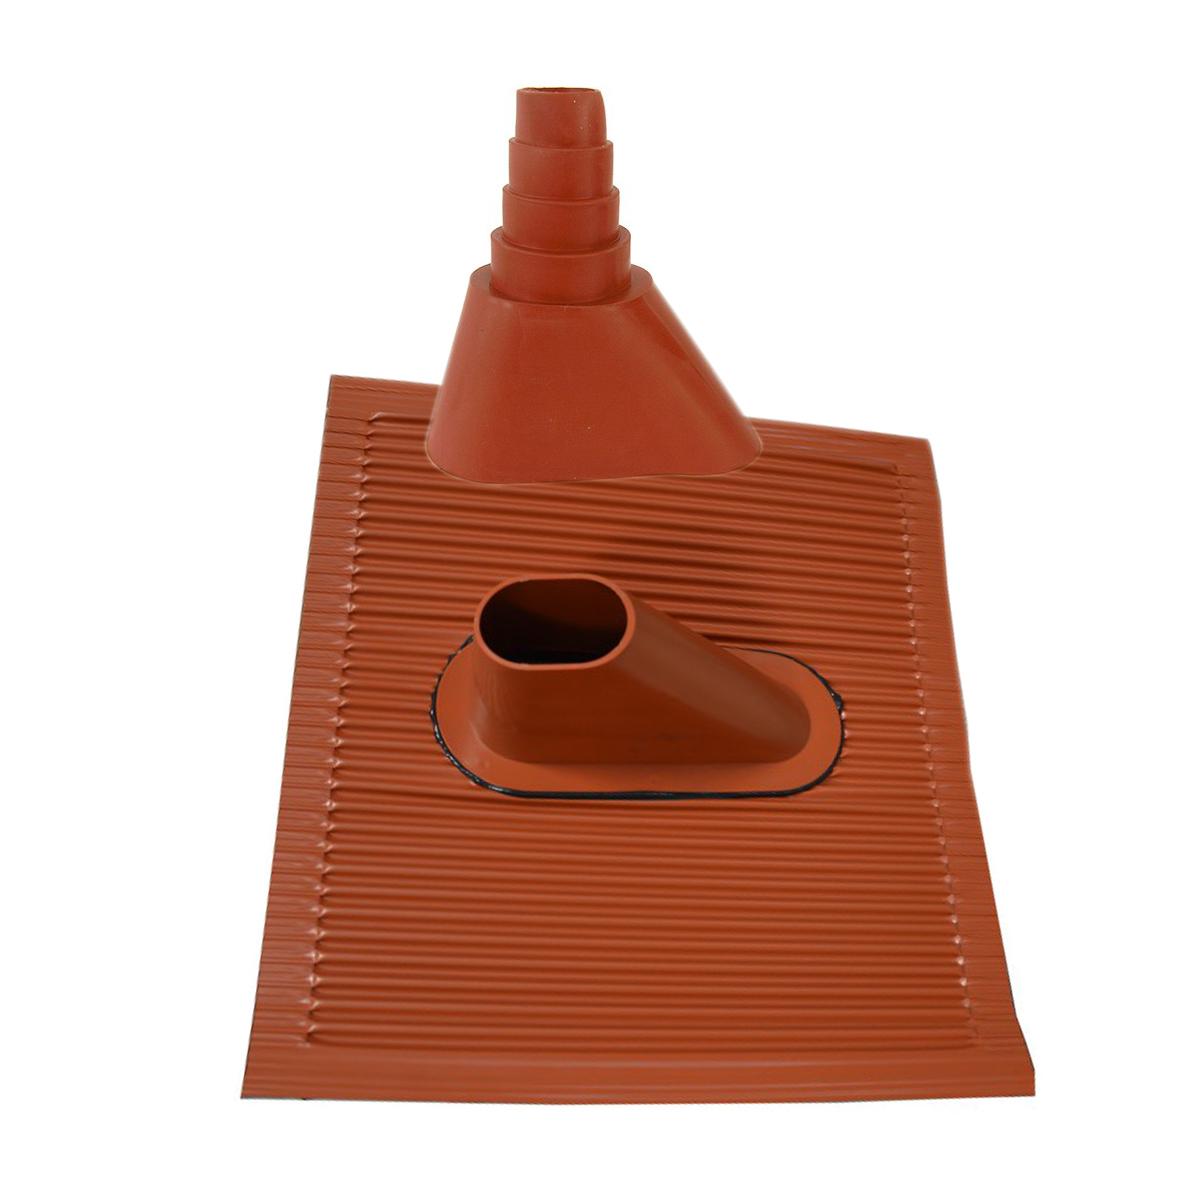 PremiumX BASIC X120-48 SAT Teleskop-Dachsparrenhalter 120cm Mast 48mm ALU-Ziegel Manschette rot